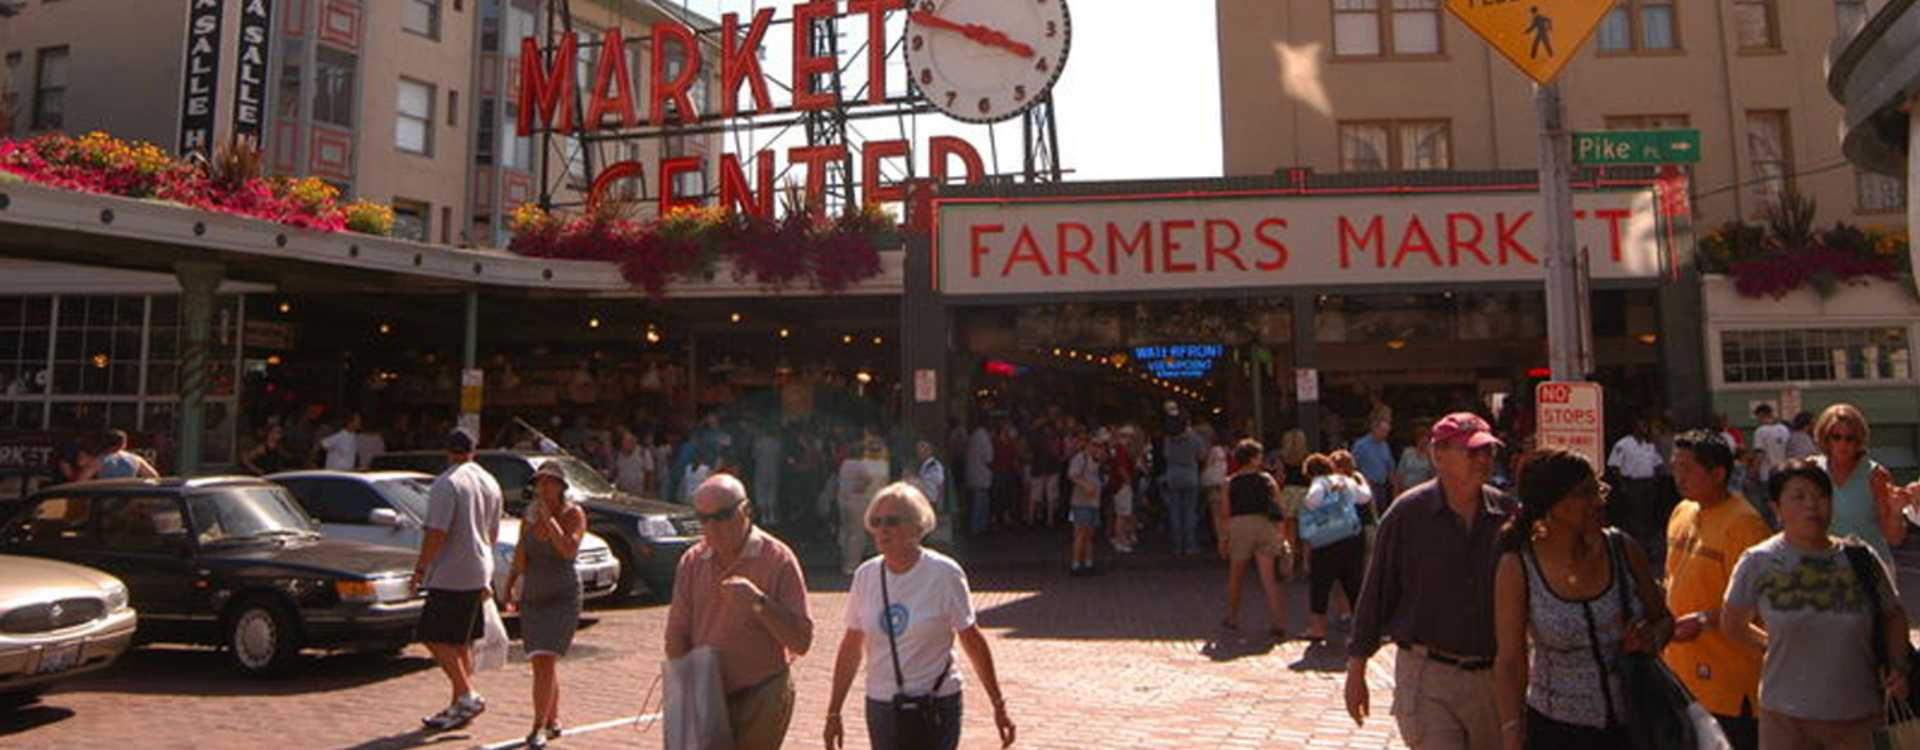 Pike_Place_Market-4.JPG